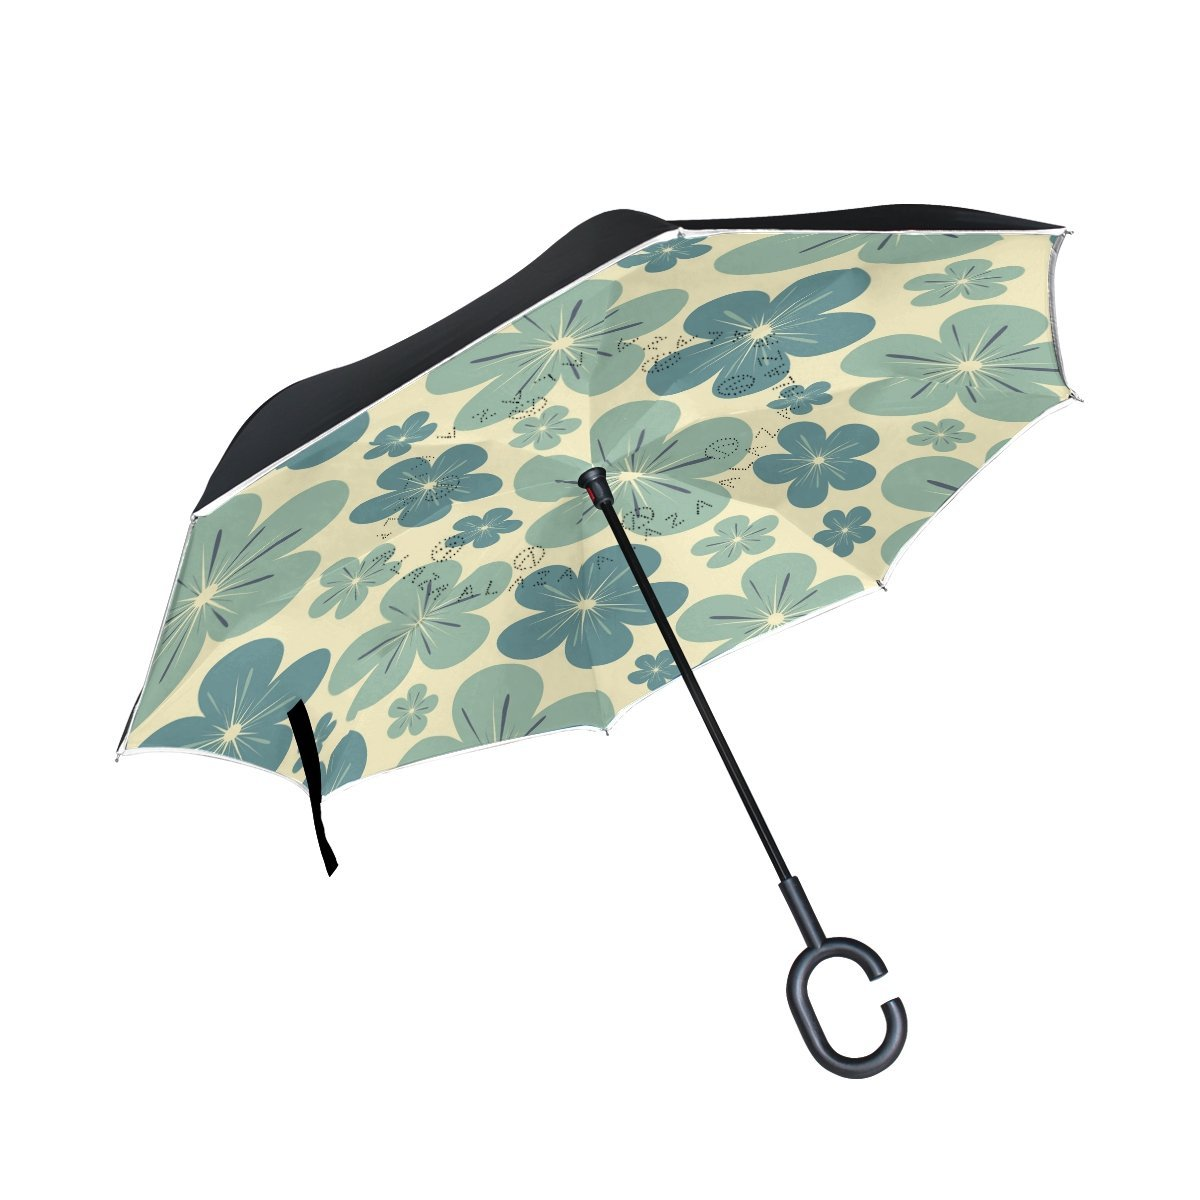 20ef60a24f66 Cheap 8k Straight Blue Umbrella, find 8k Straight Blue Umbrella ...